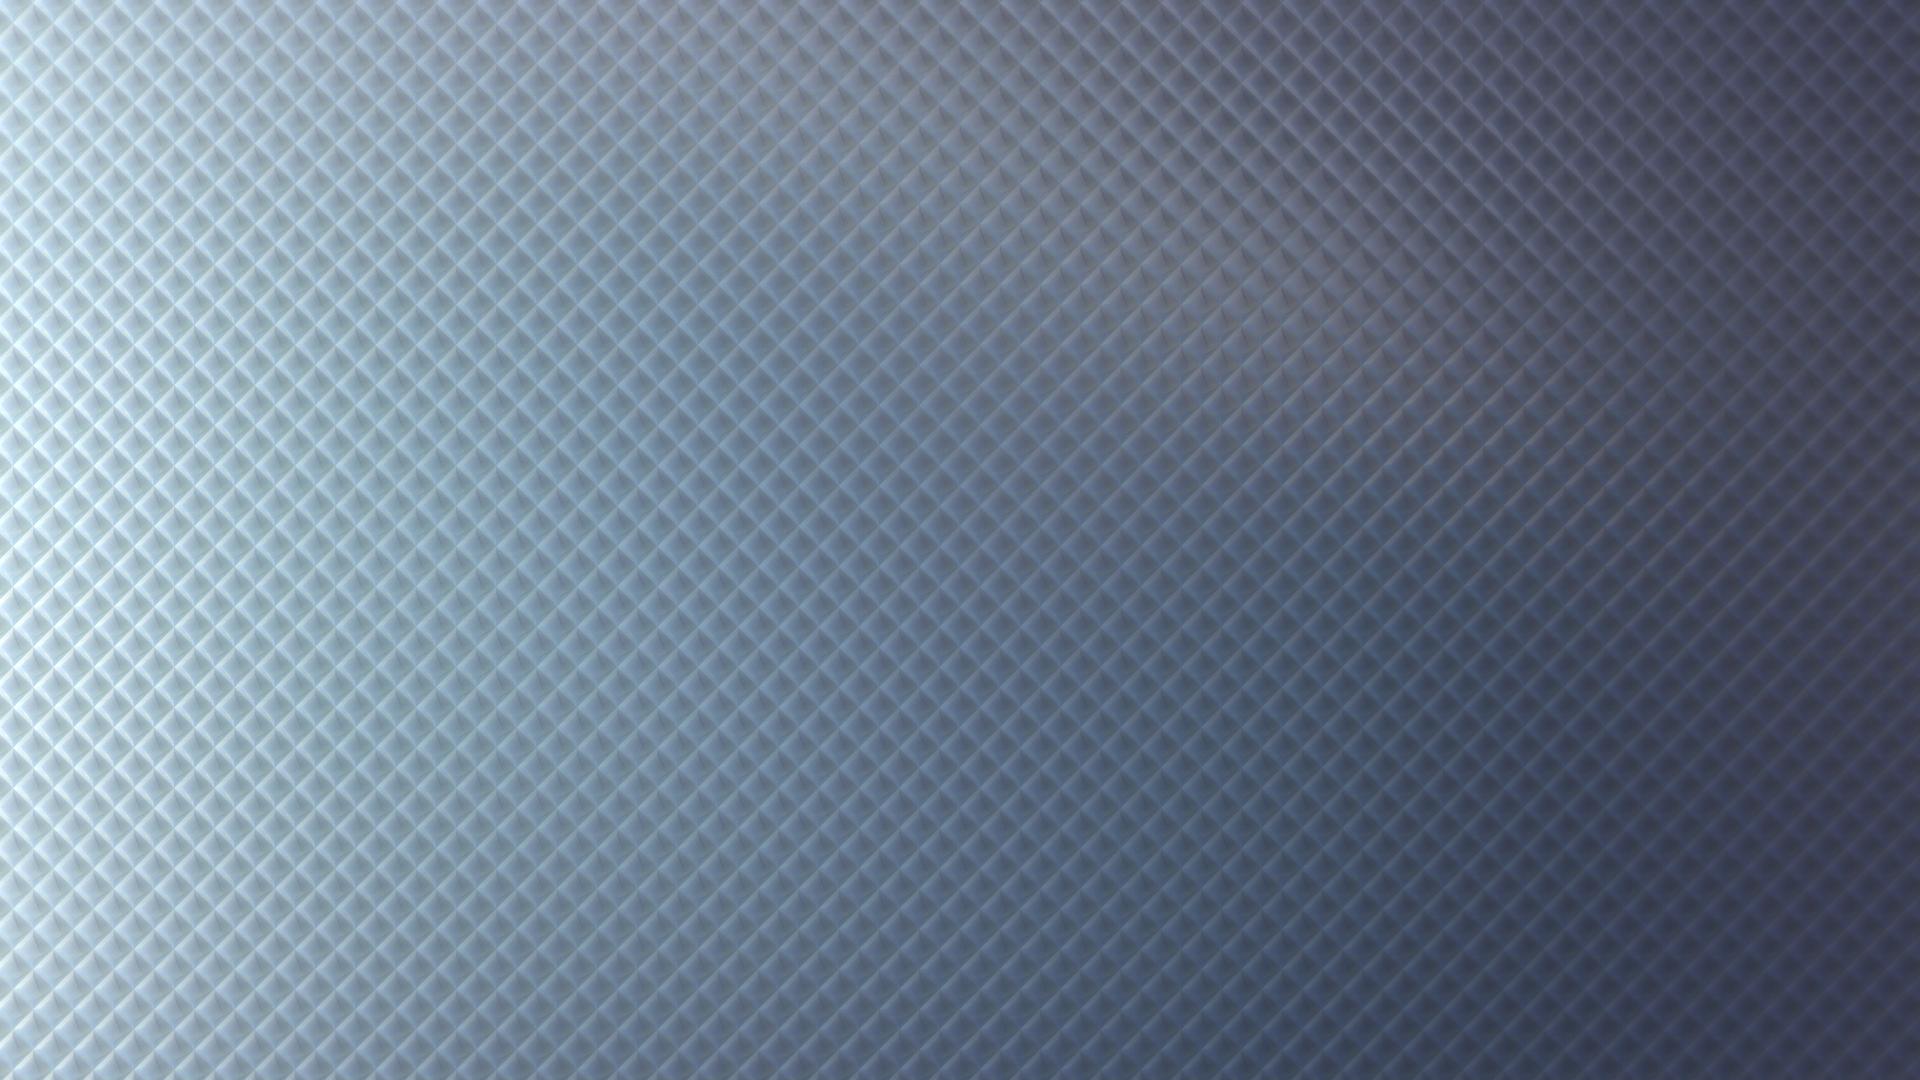 background overlay